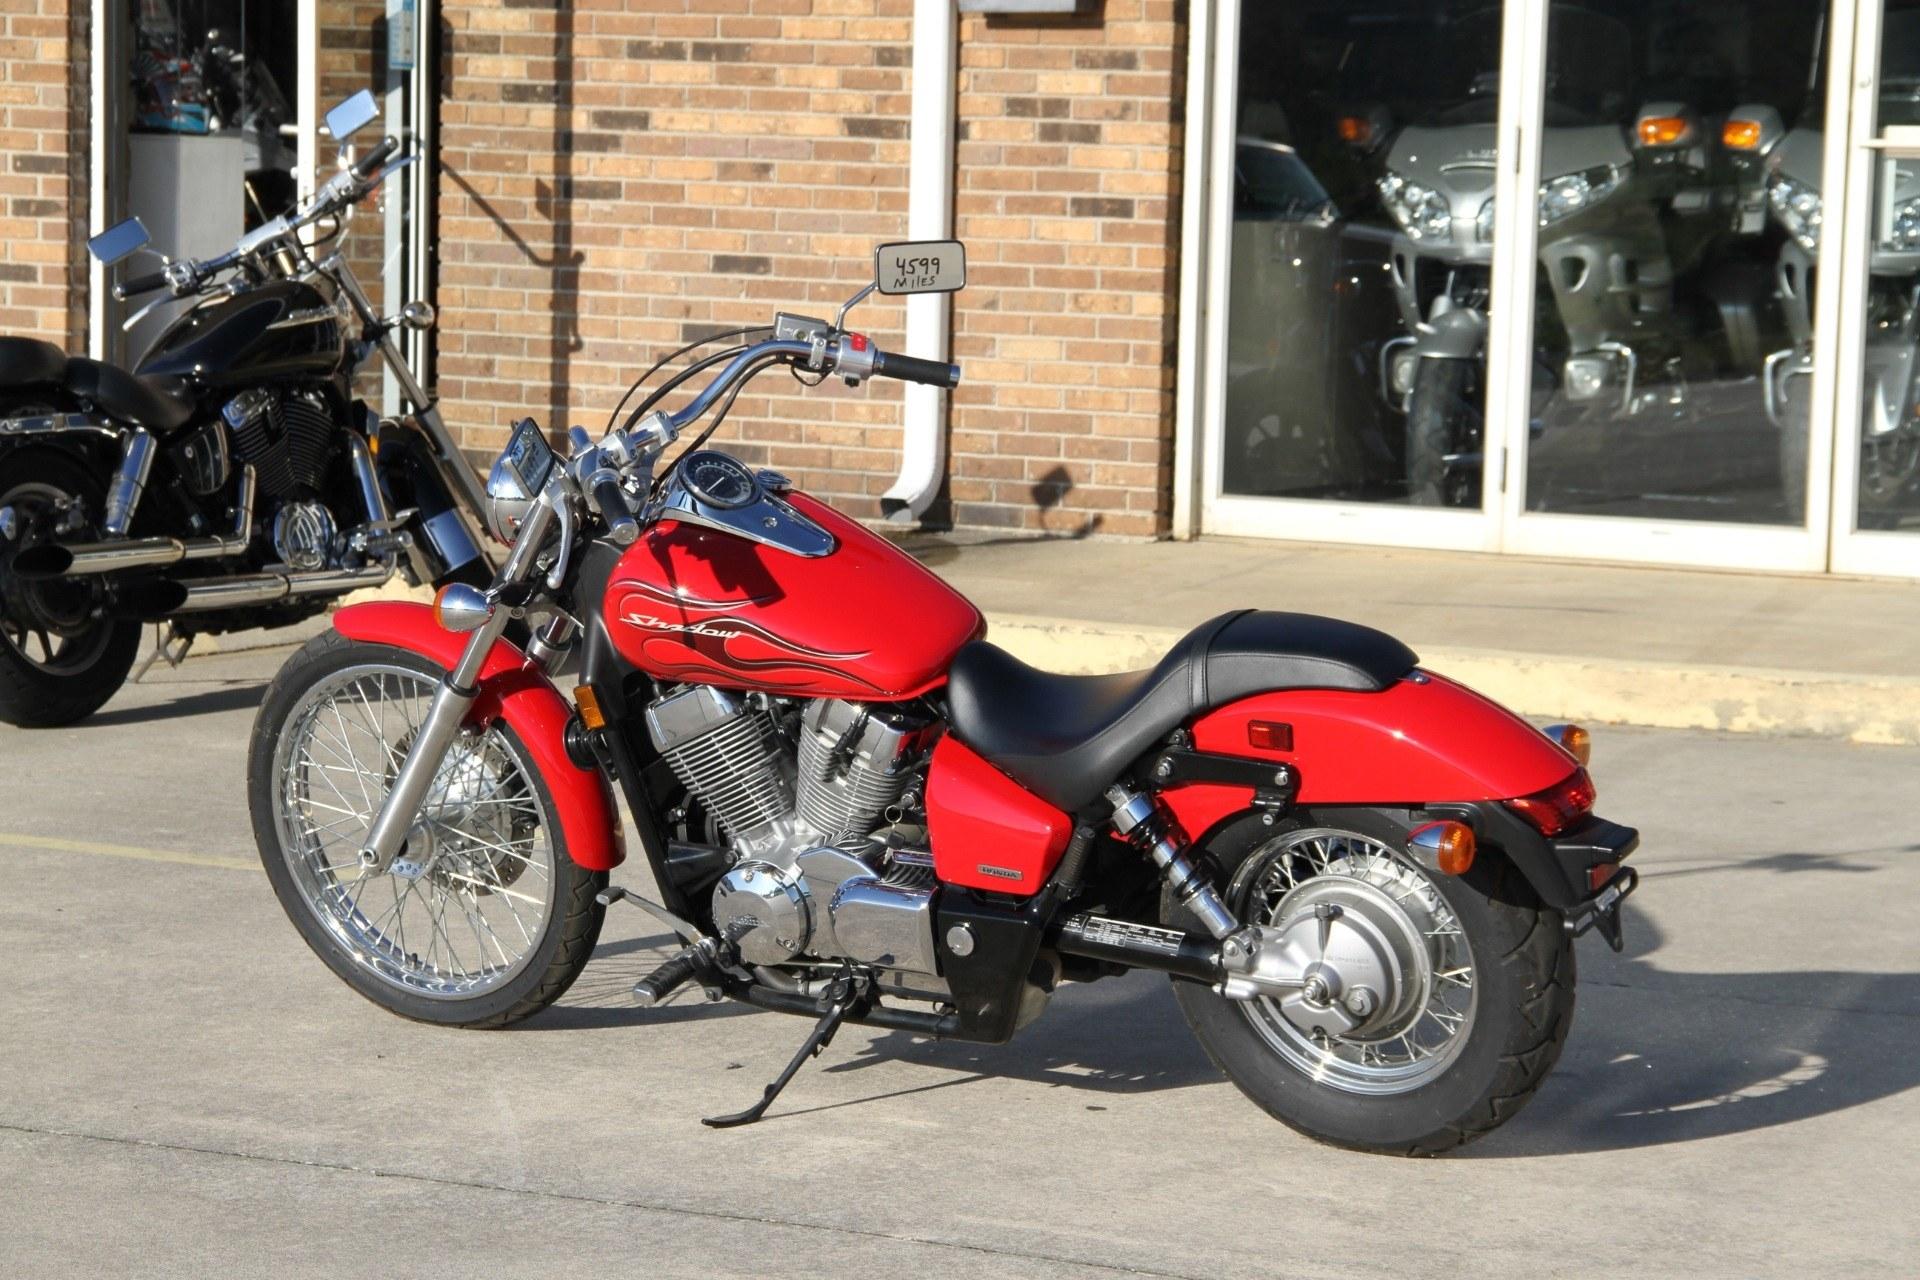 used 2007 honda shadow spirit 750 c2 motorcycles in hendersonville nc stock number 000285. Black Bedroom Furniture Sets. Home Design Ideas